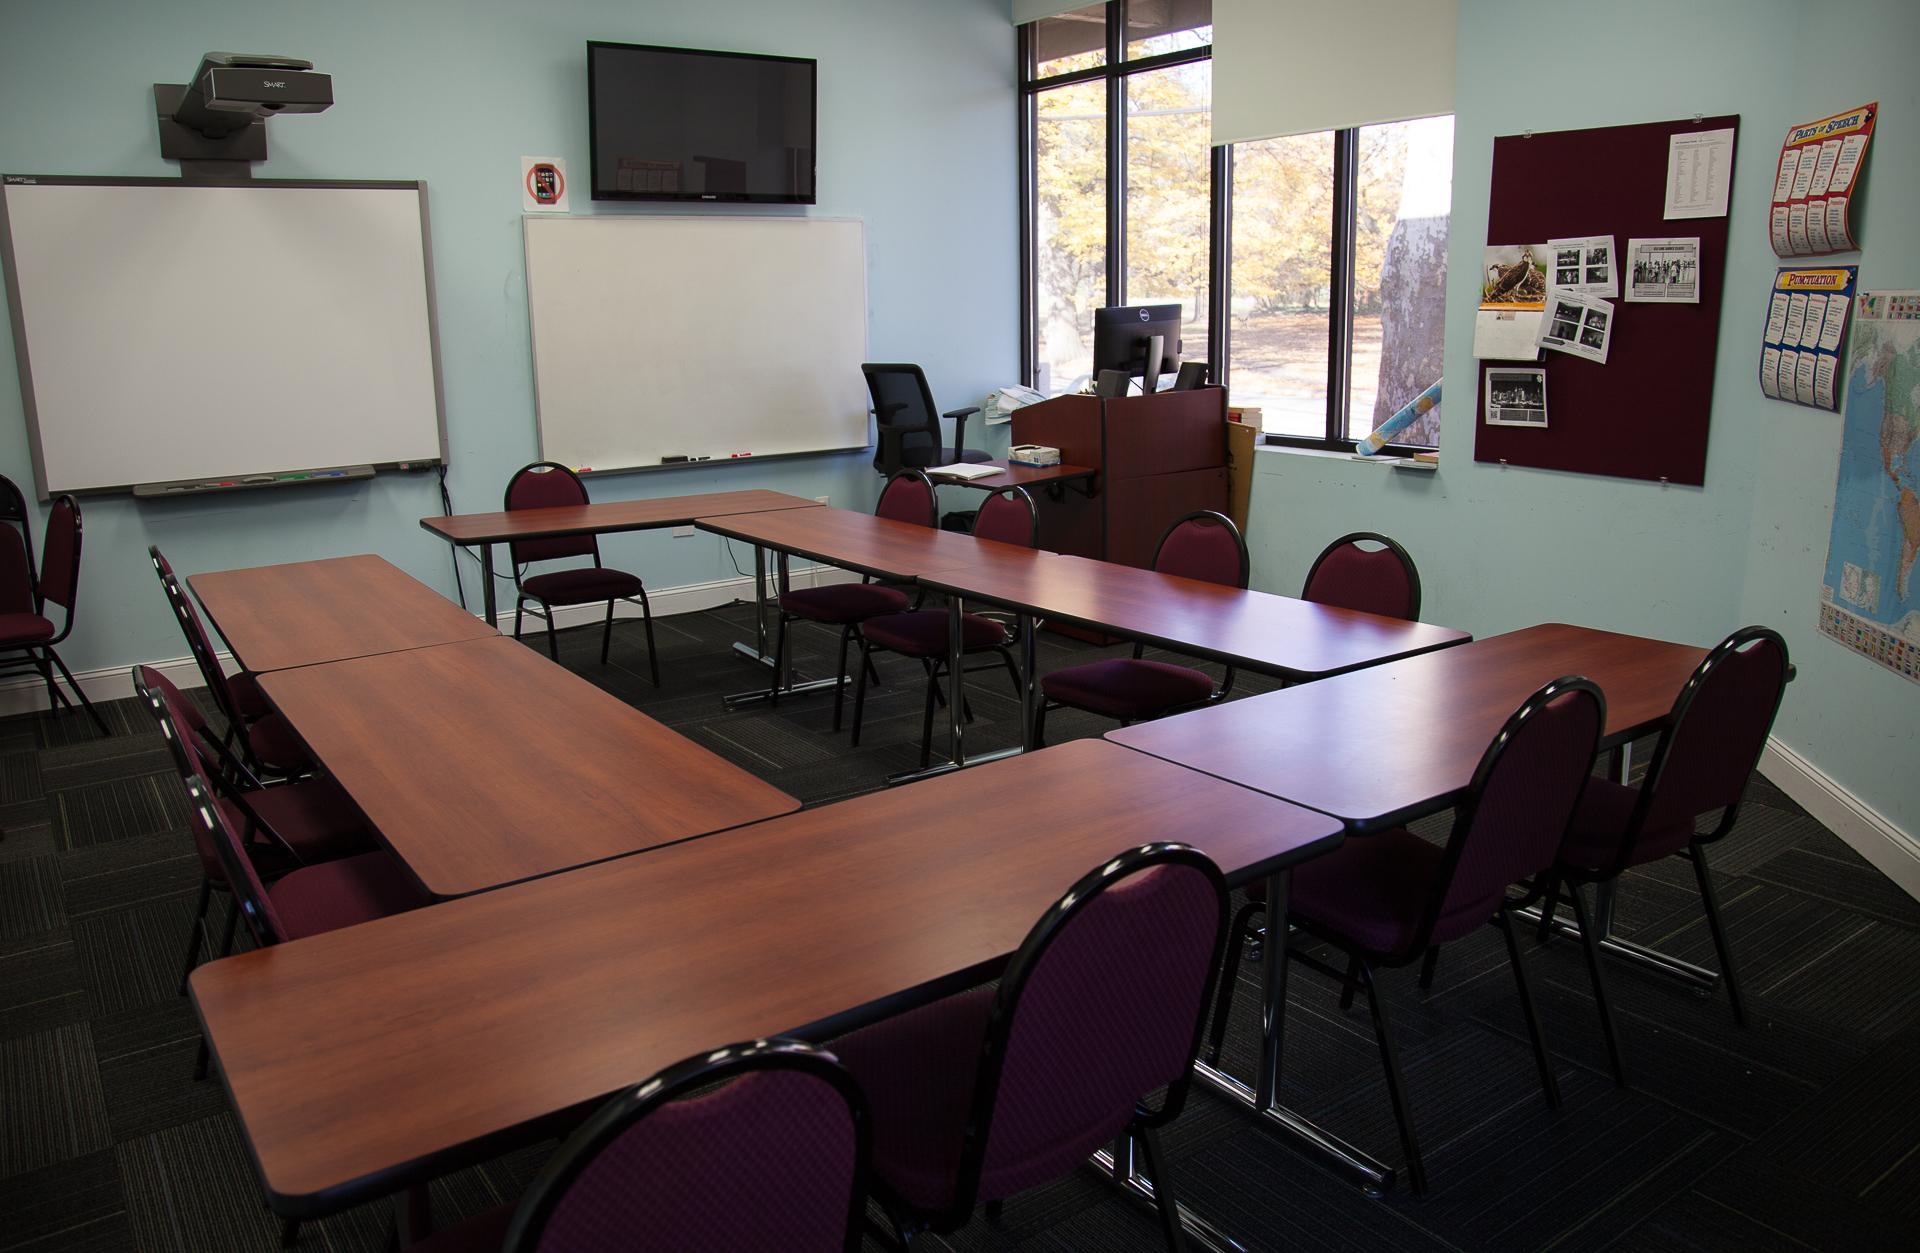 Classroom, ELI building, 108 East Main St.